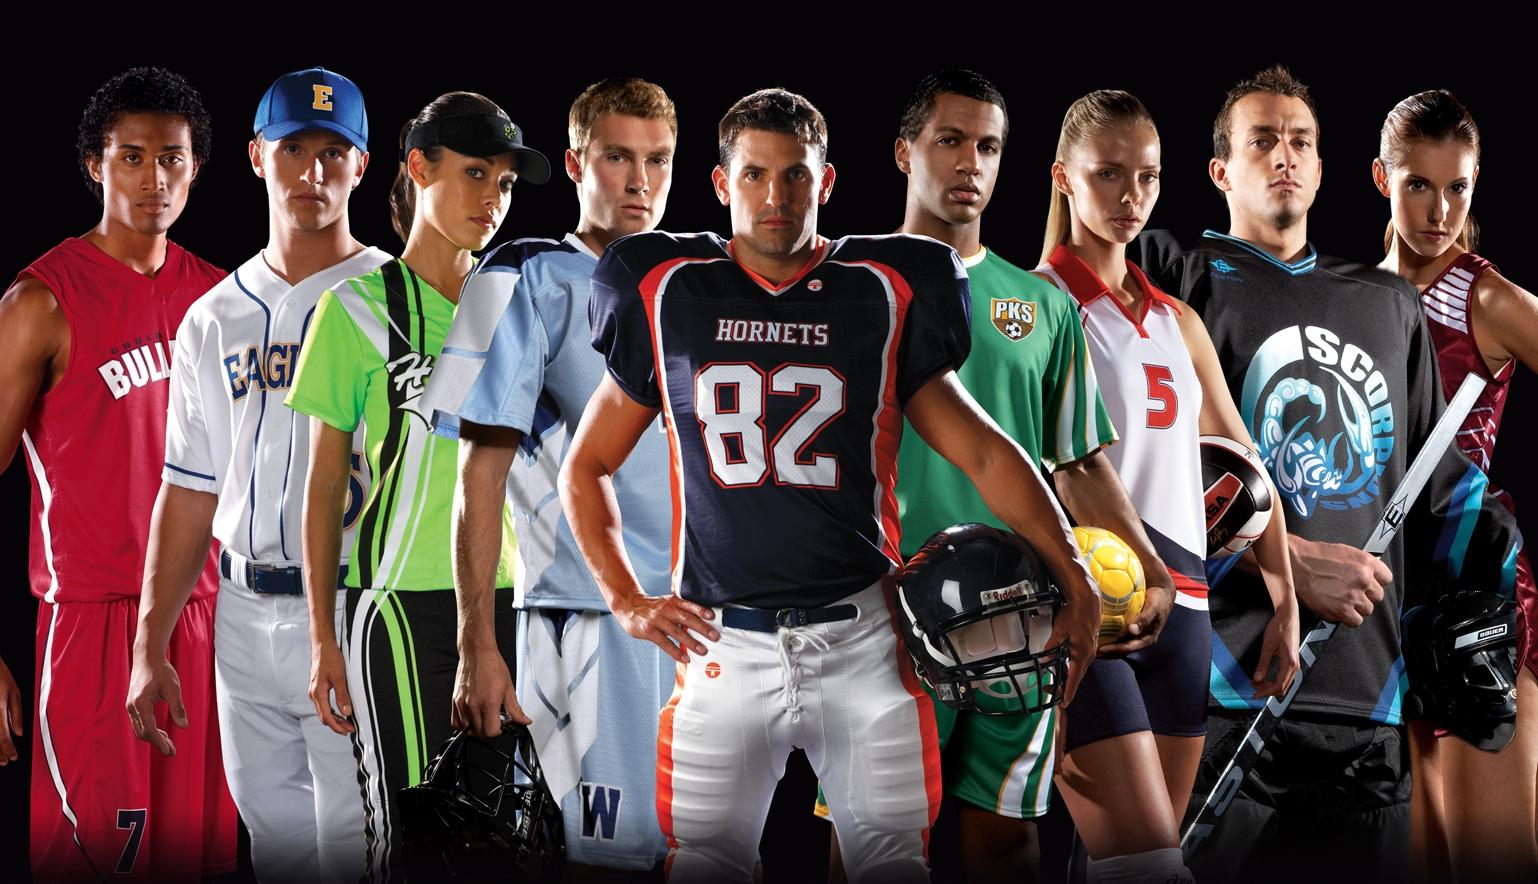 high-school-sports.jpg